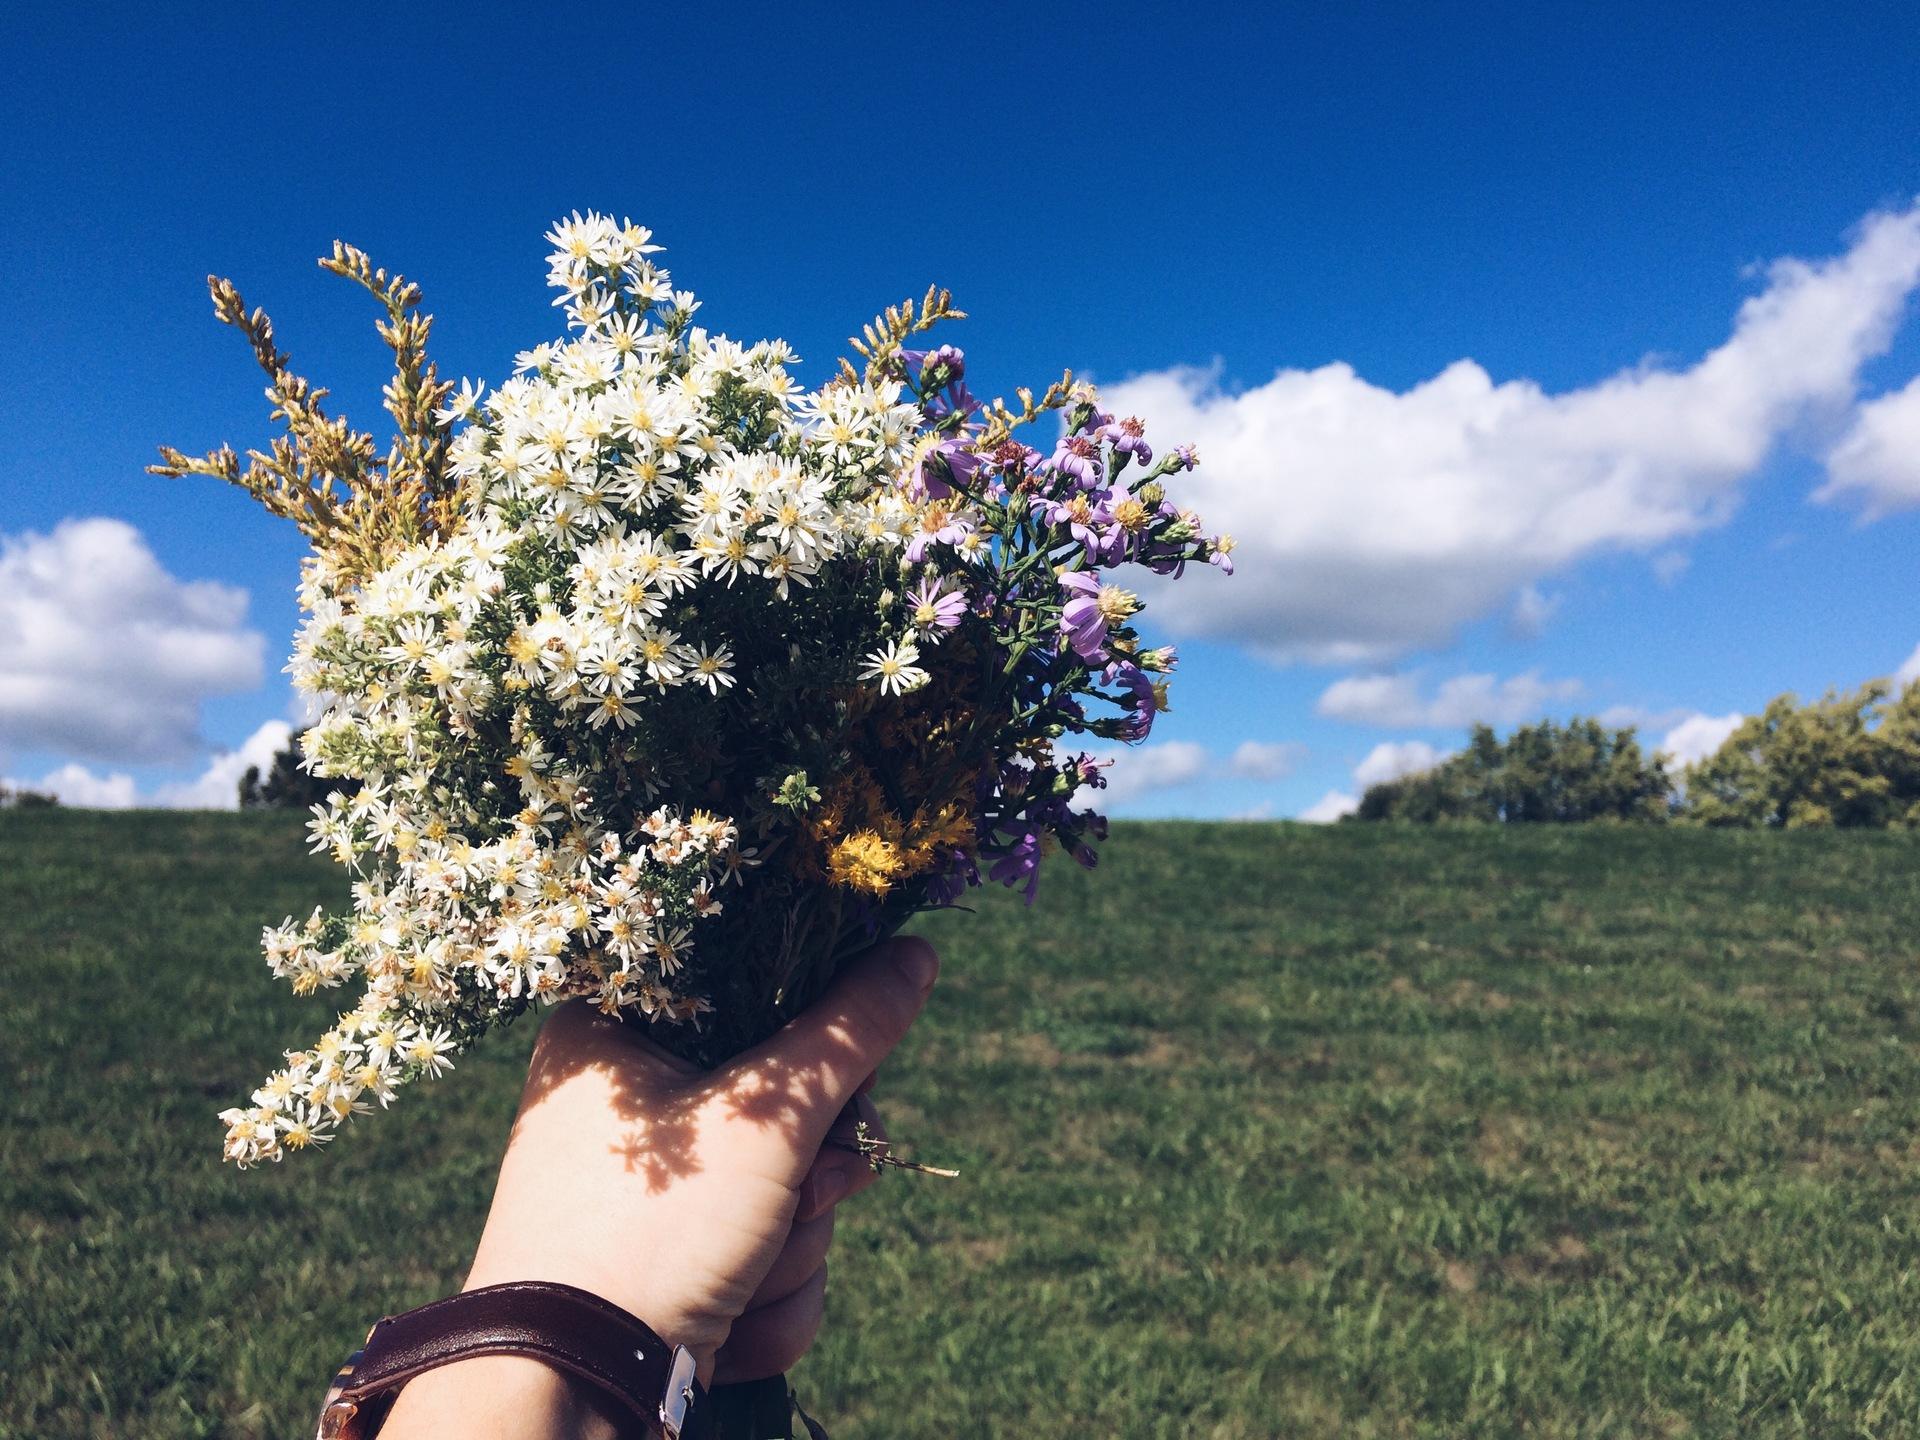 tree | nature, landscape, flower, summer